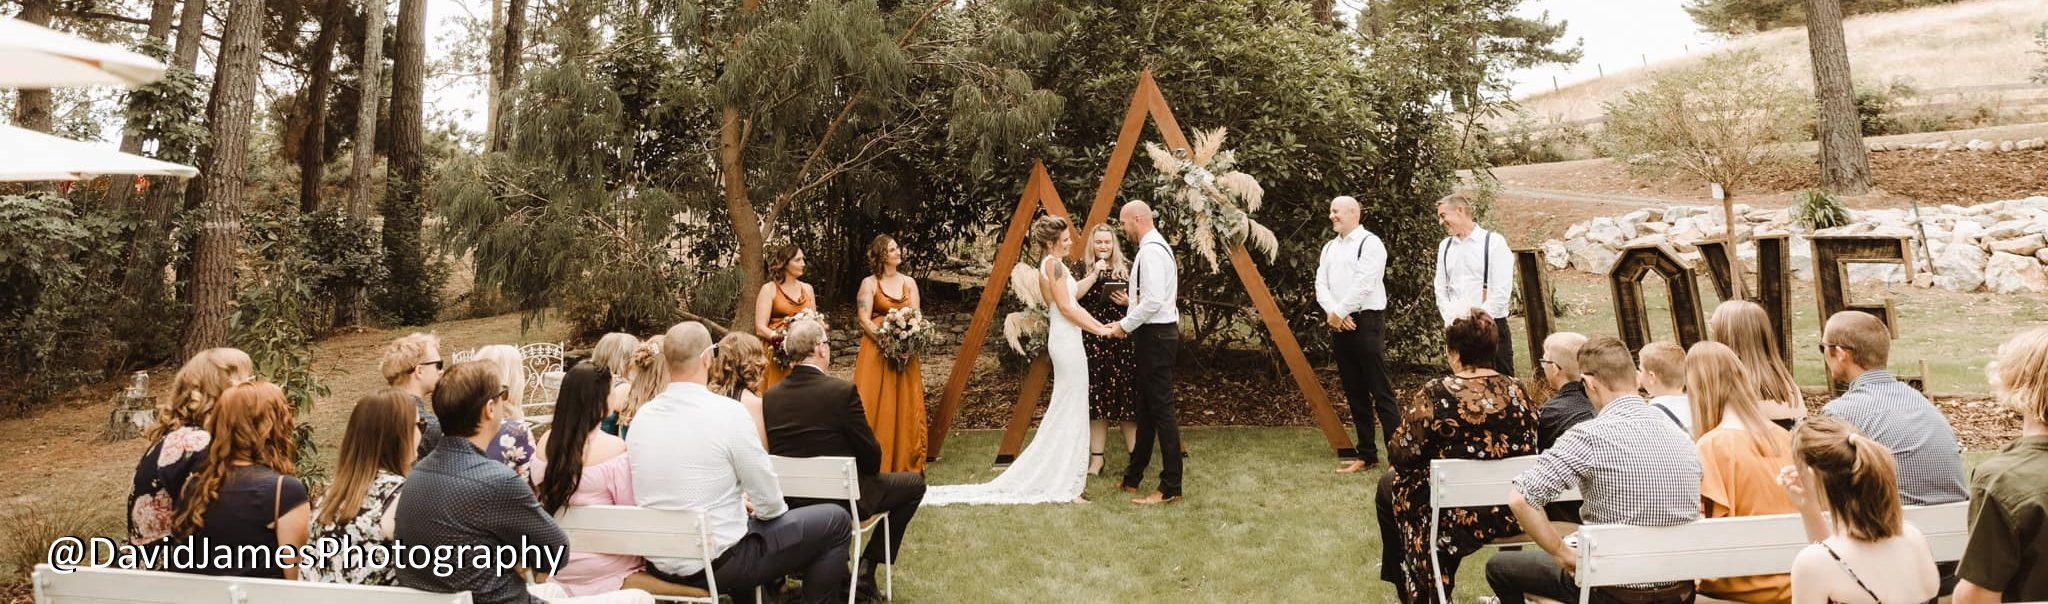 Marriage Celebrant Nelson Tasman Emma performing a wedding